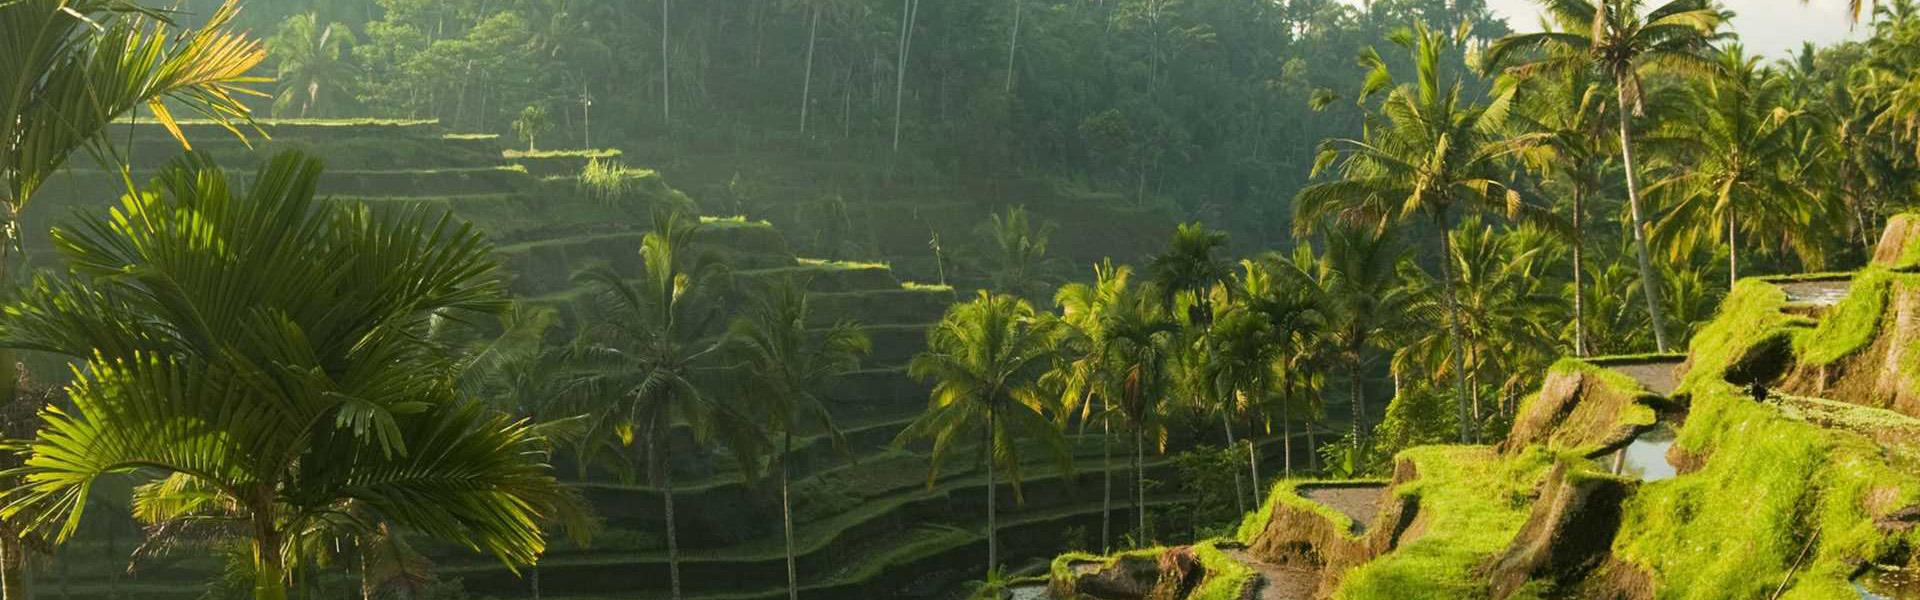 indonesia bali rice fields 1920x1080 - Bali - 20.10.2017